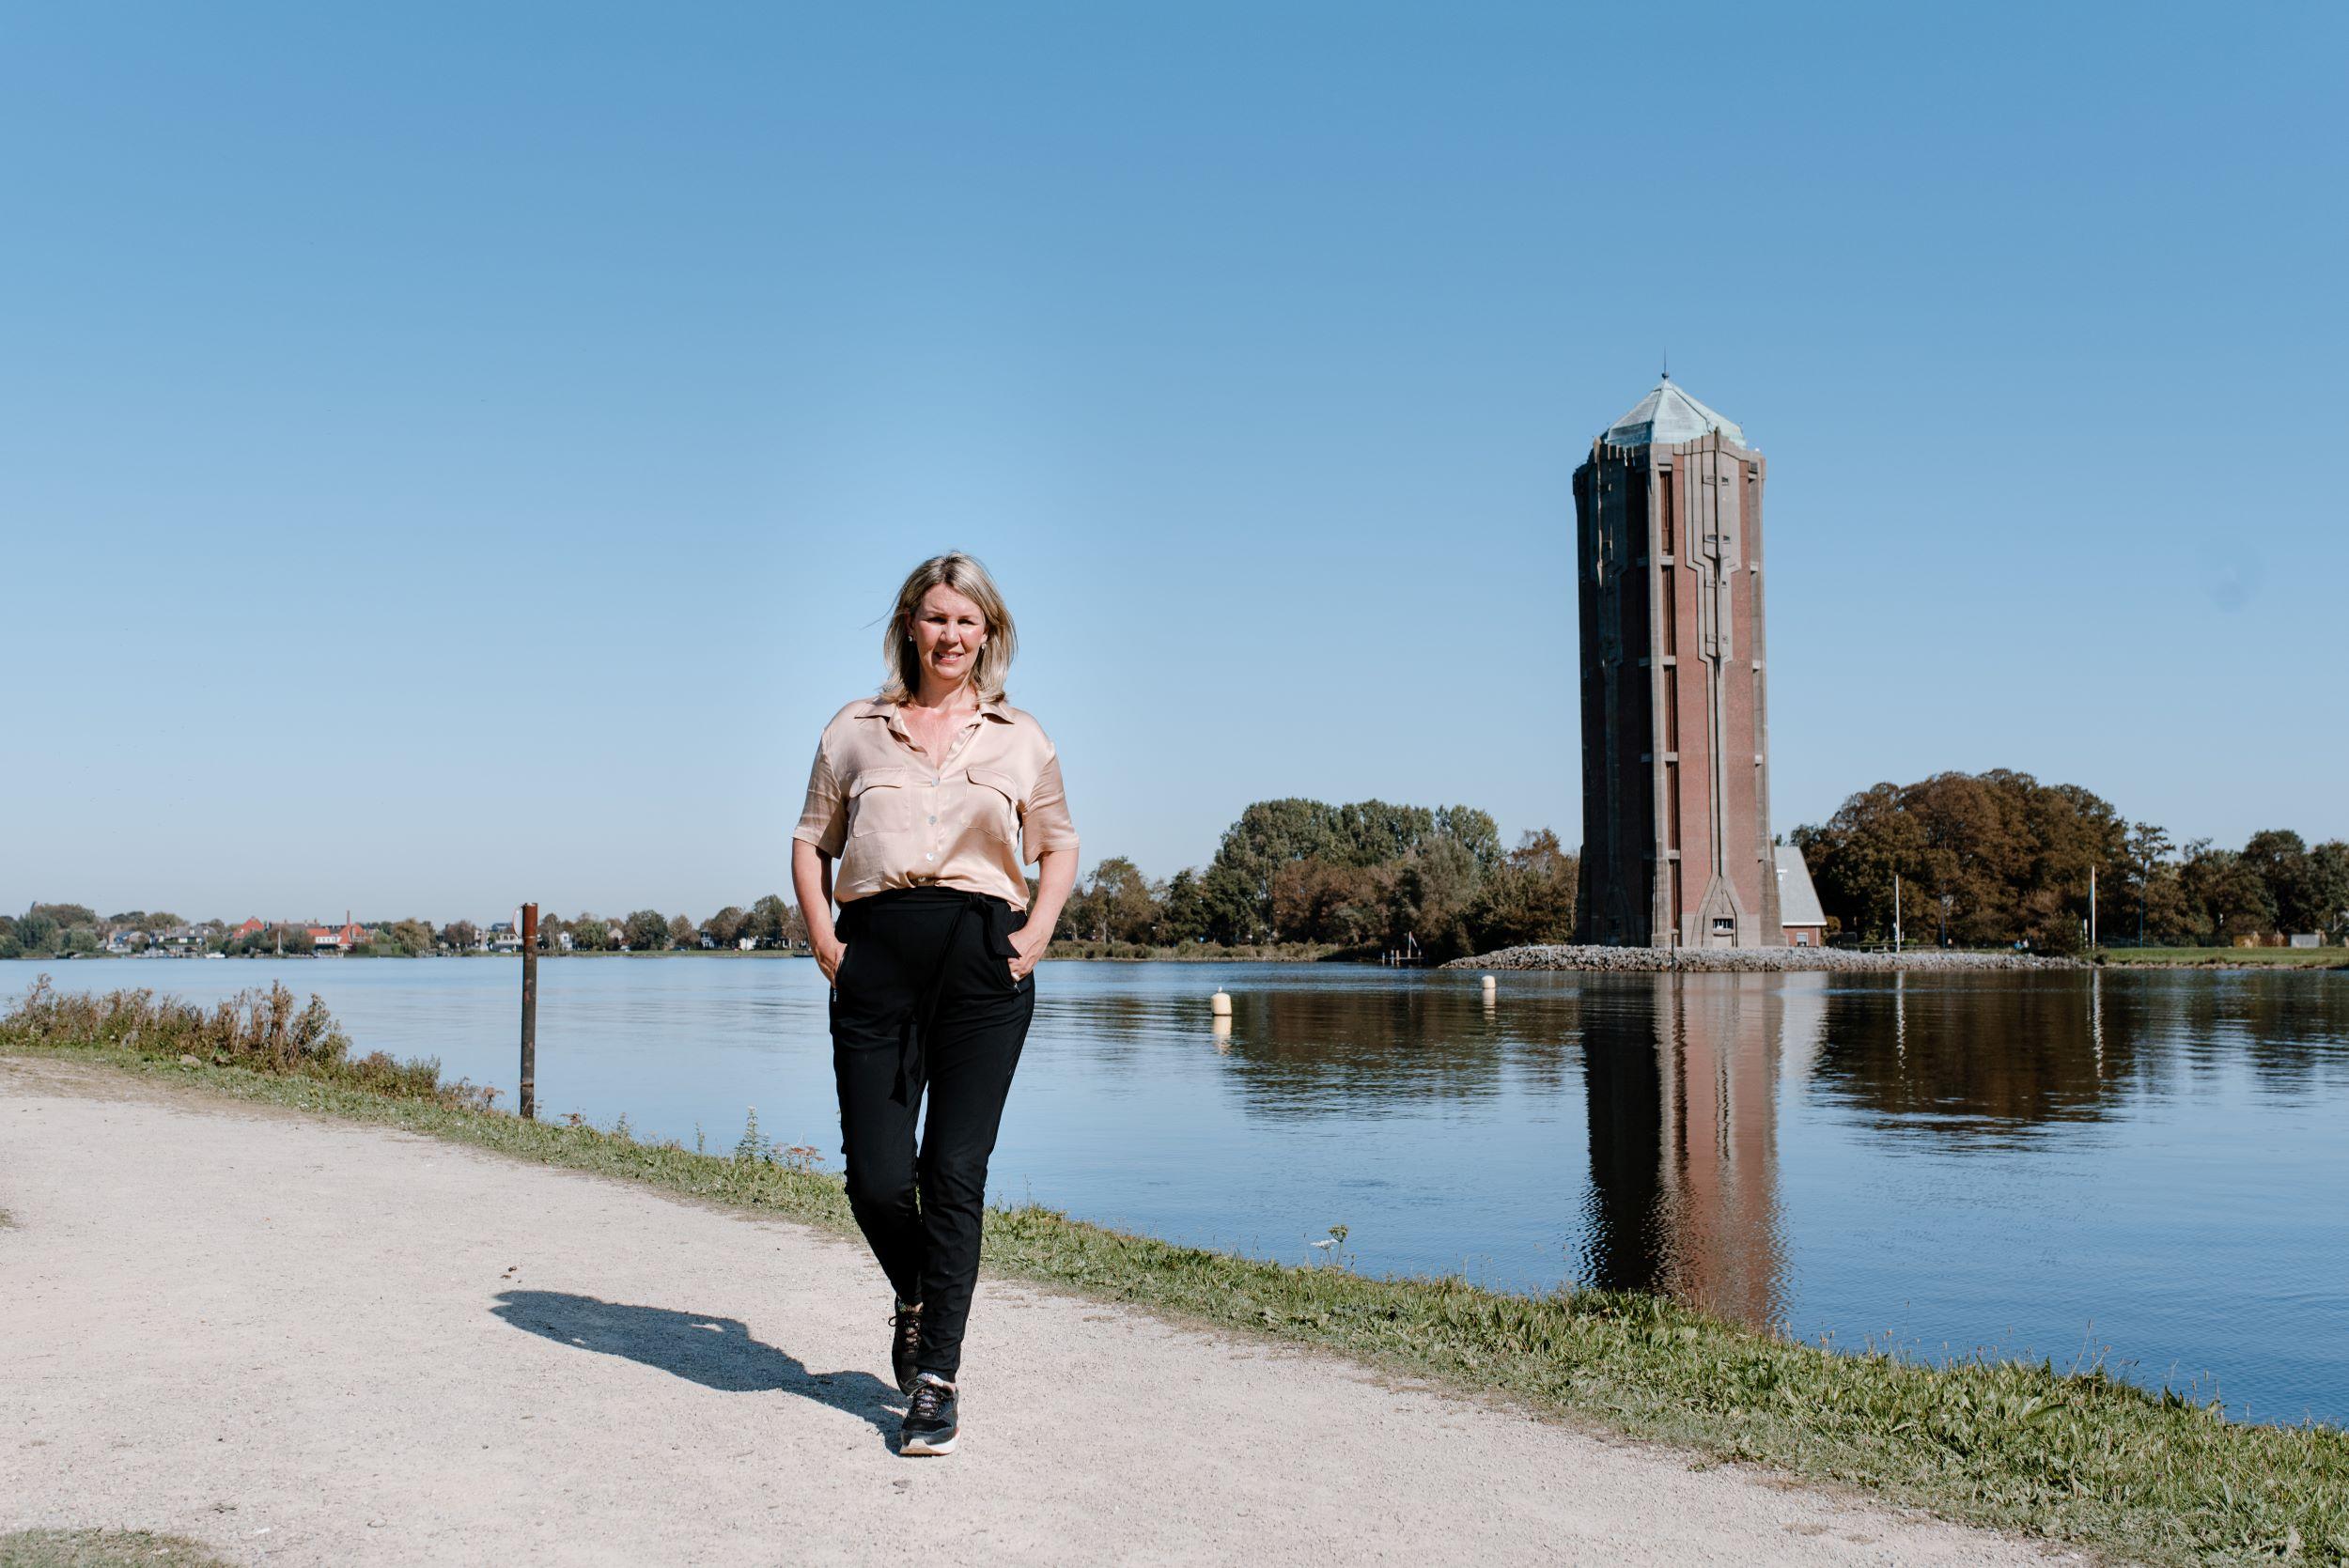 Beau naturel Sandra Bakker